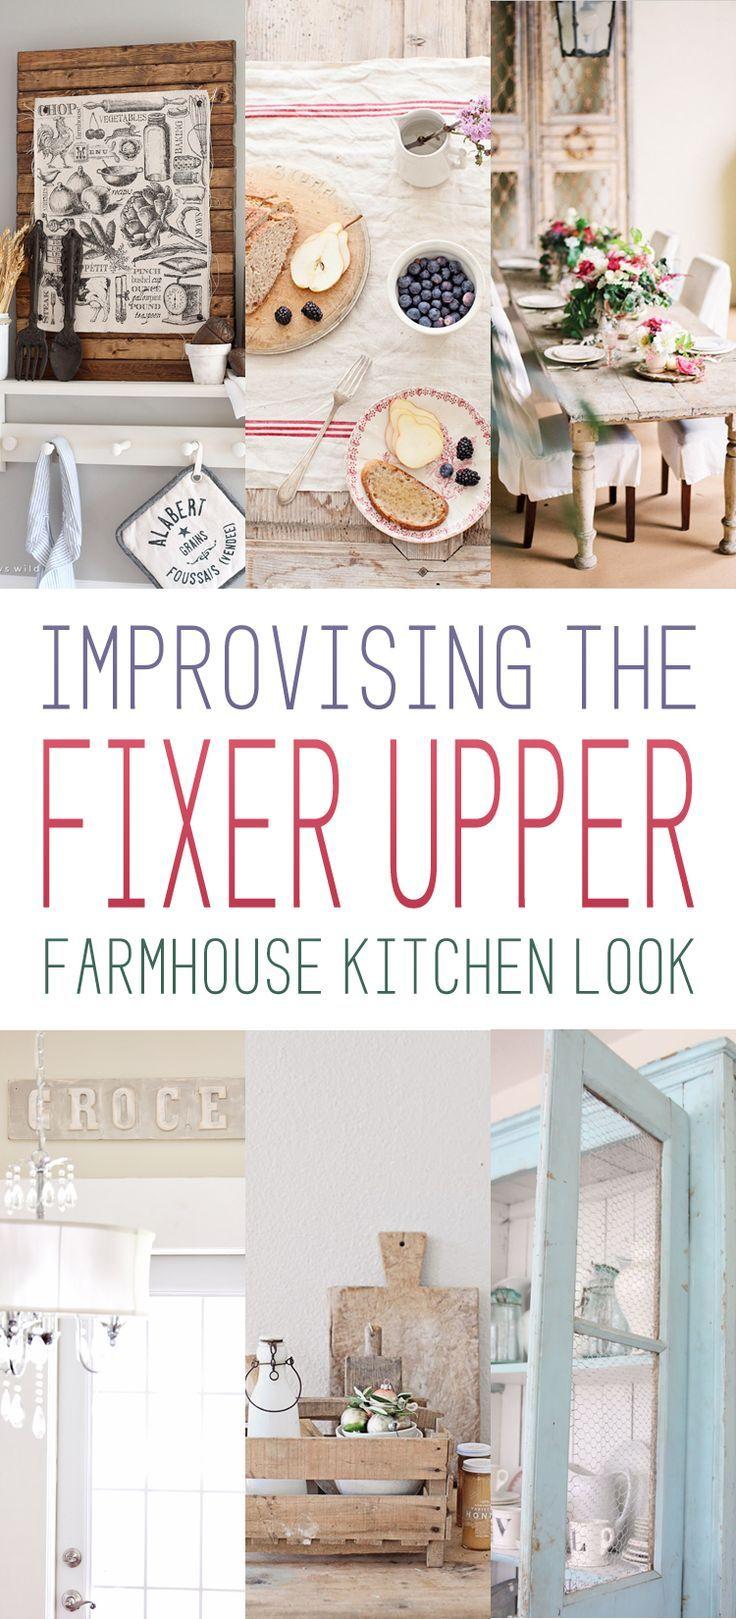 Fixer upper kitchen signs - The Fixer Upper Farmhouse Kitchen Look